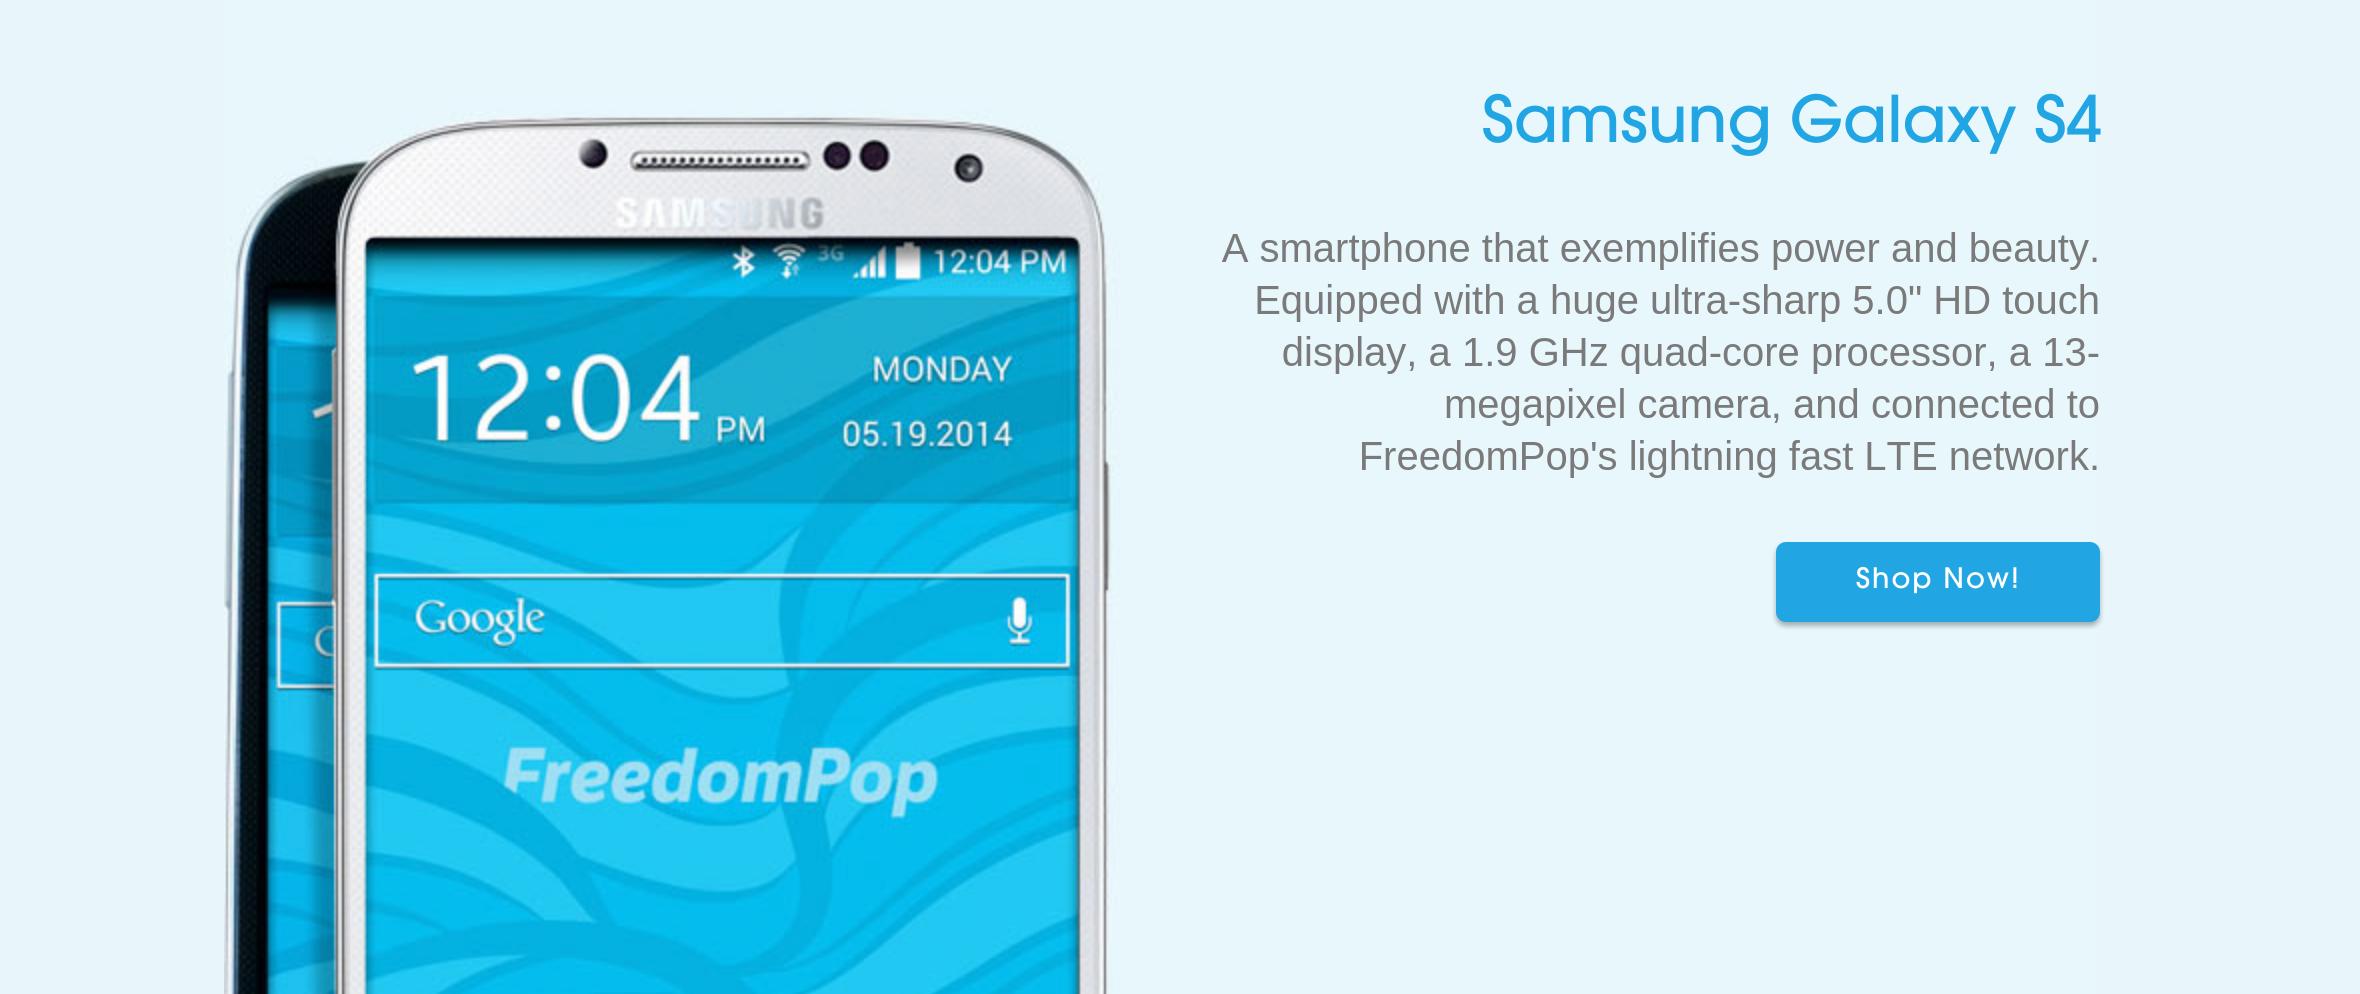 Phone number freedompop